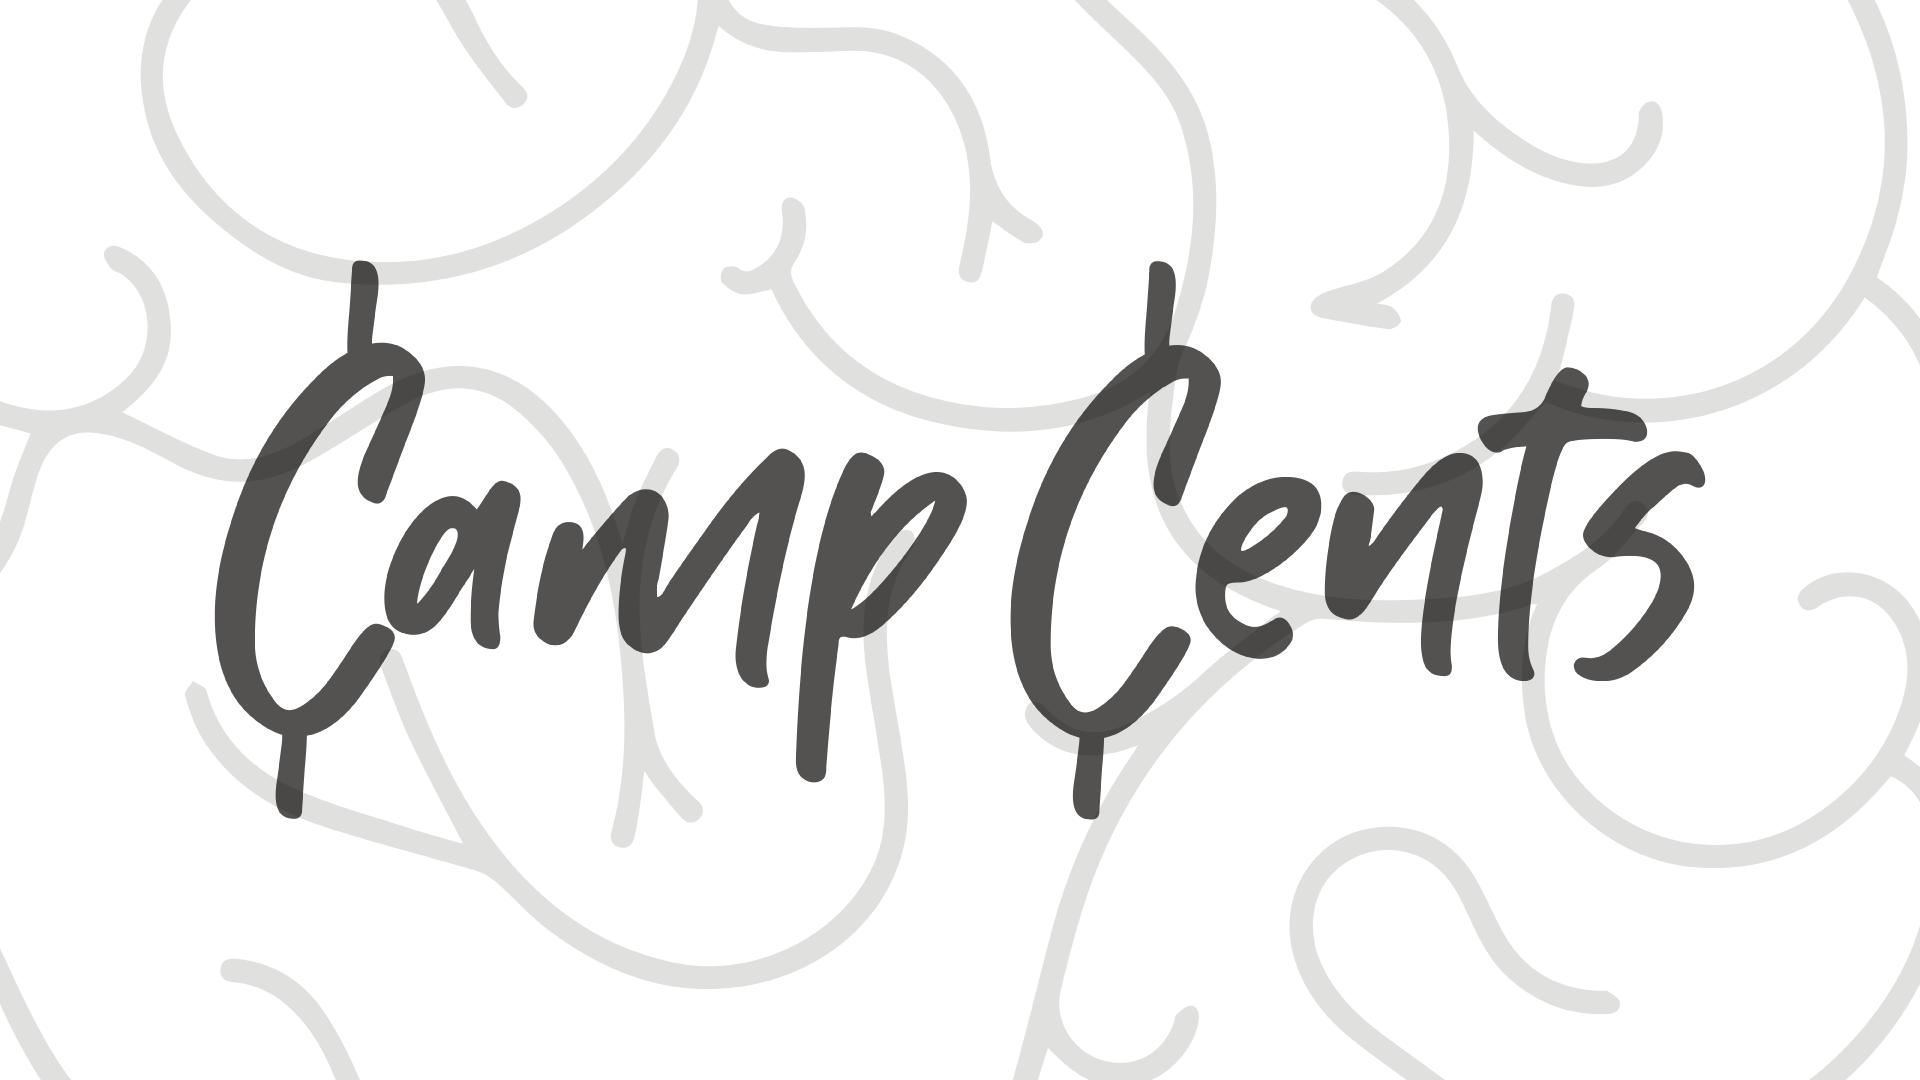 Title: Camp Cents